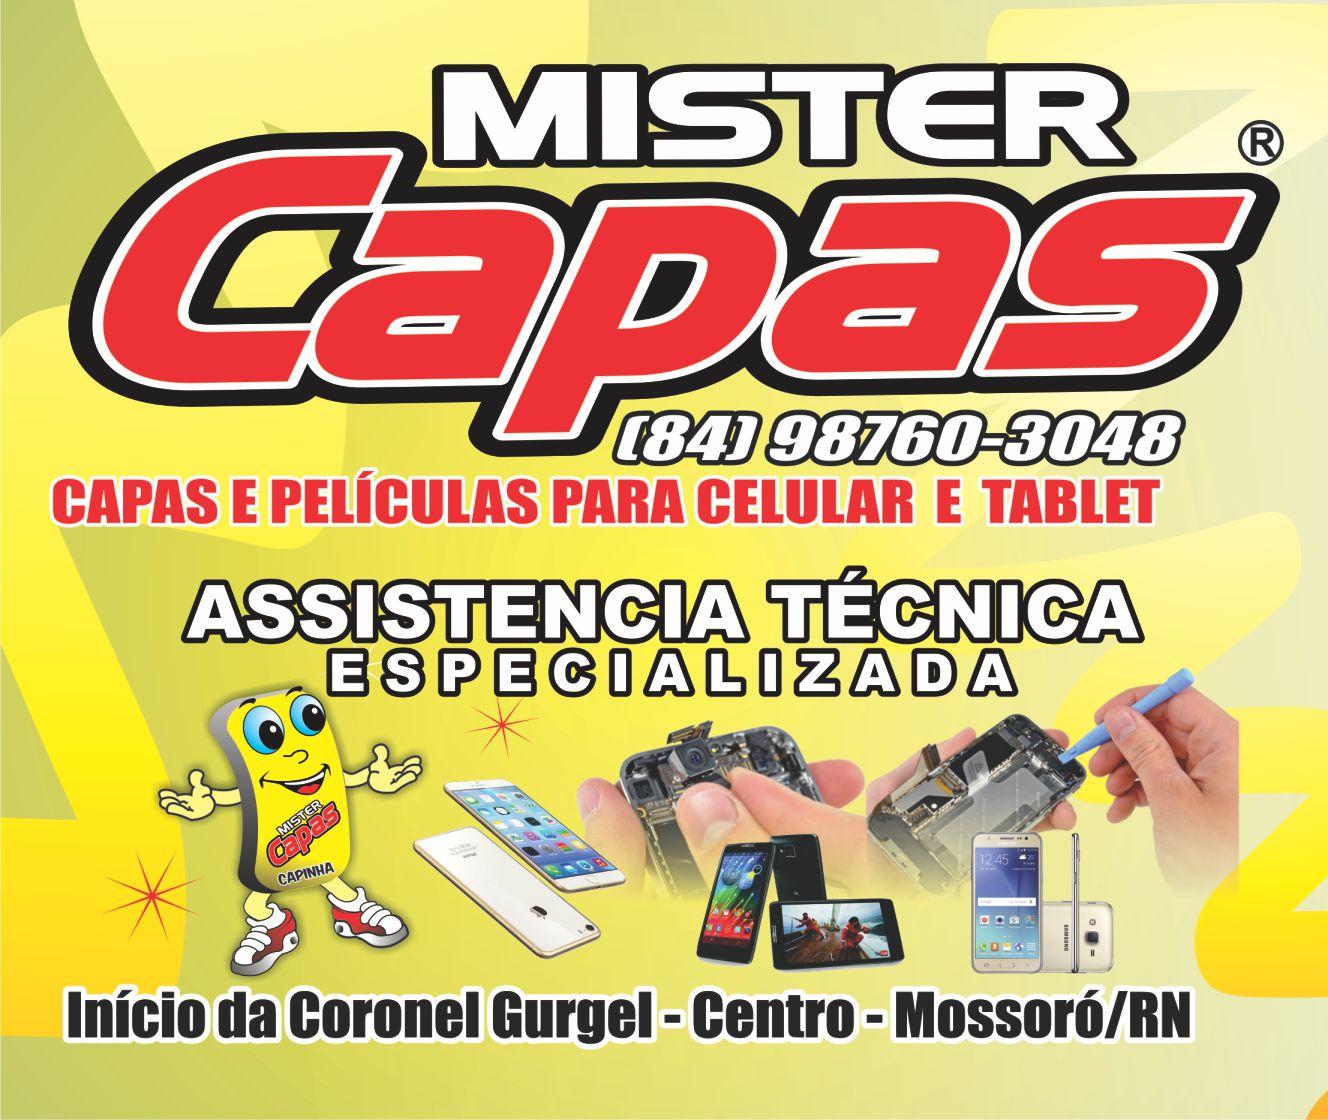 MISTER CAPAS